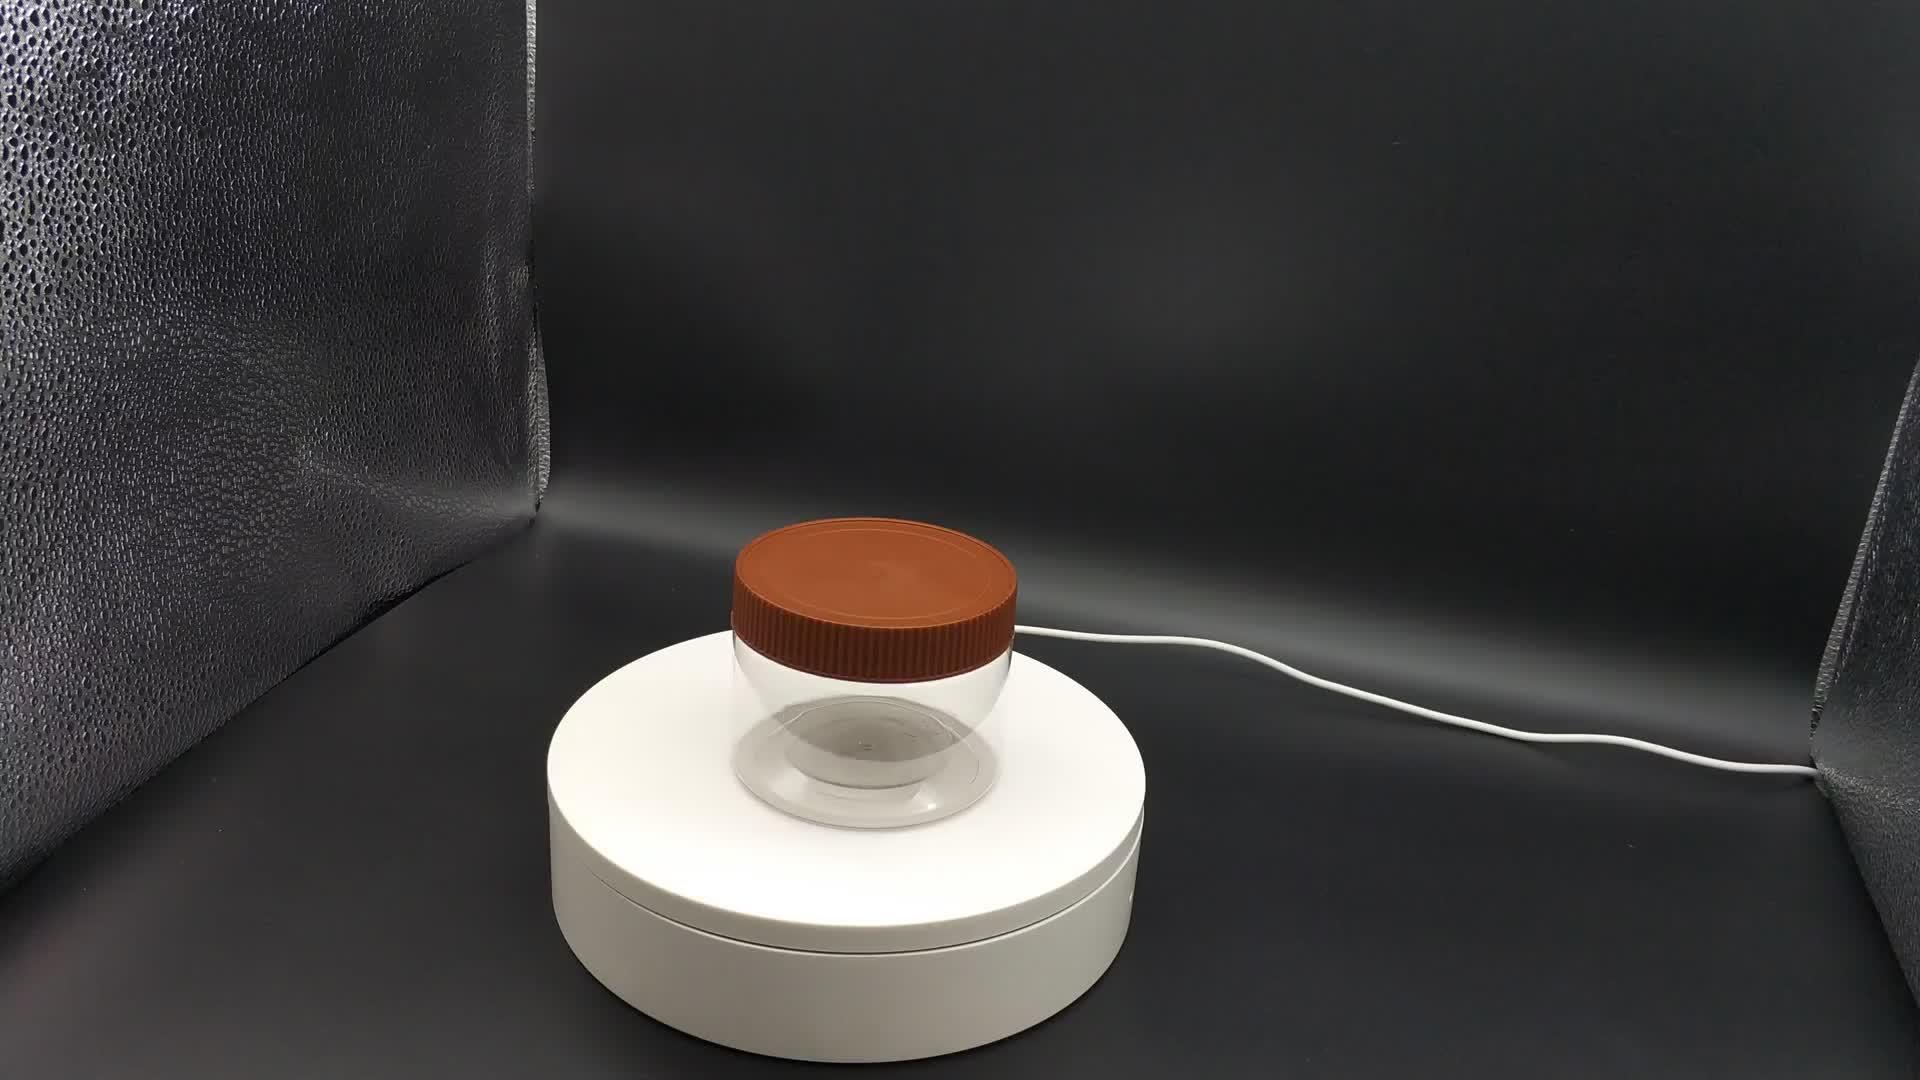 Wholesale 10oz Empty Plastic Sauce Bottle PET Custom Ketchup Jars with Flip Lids